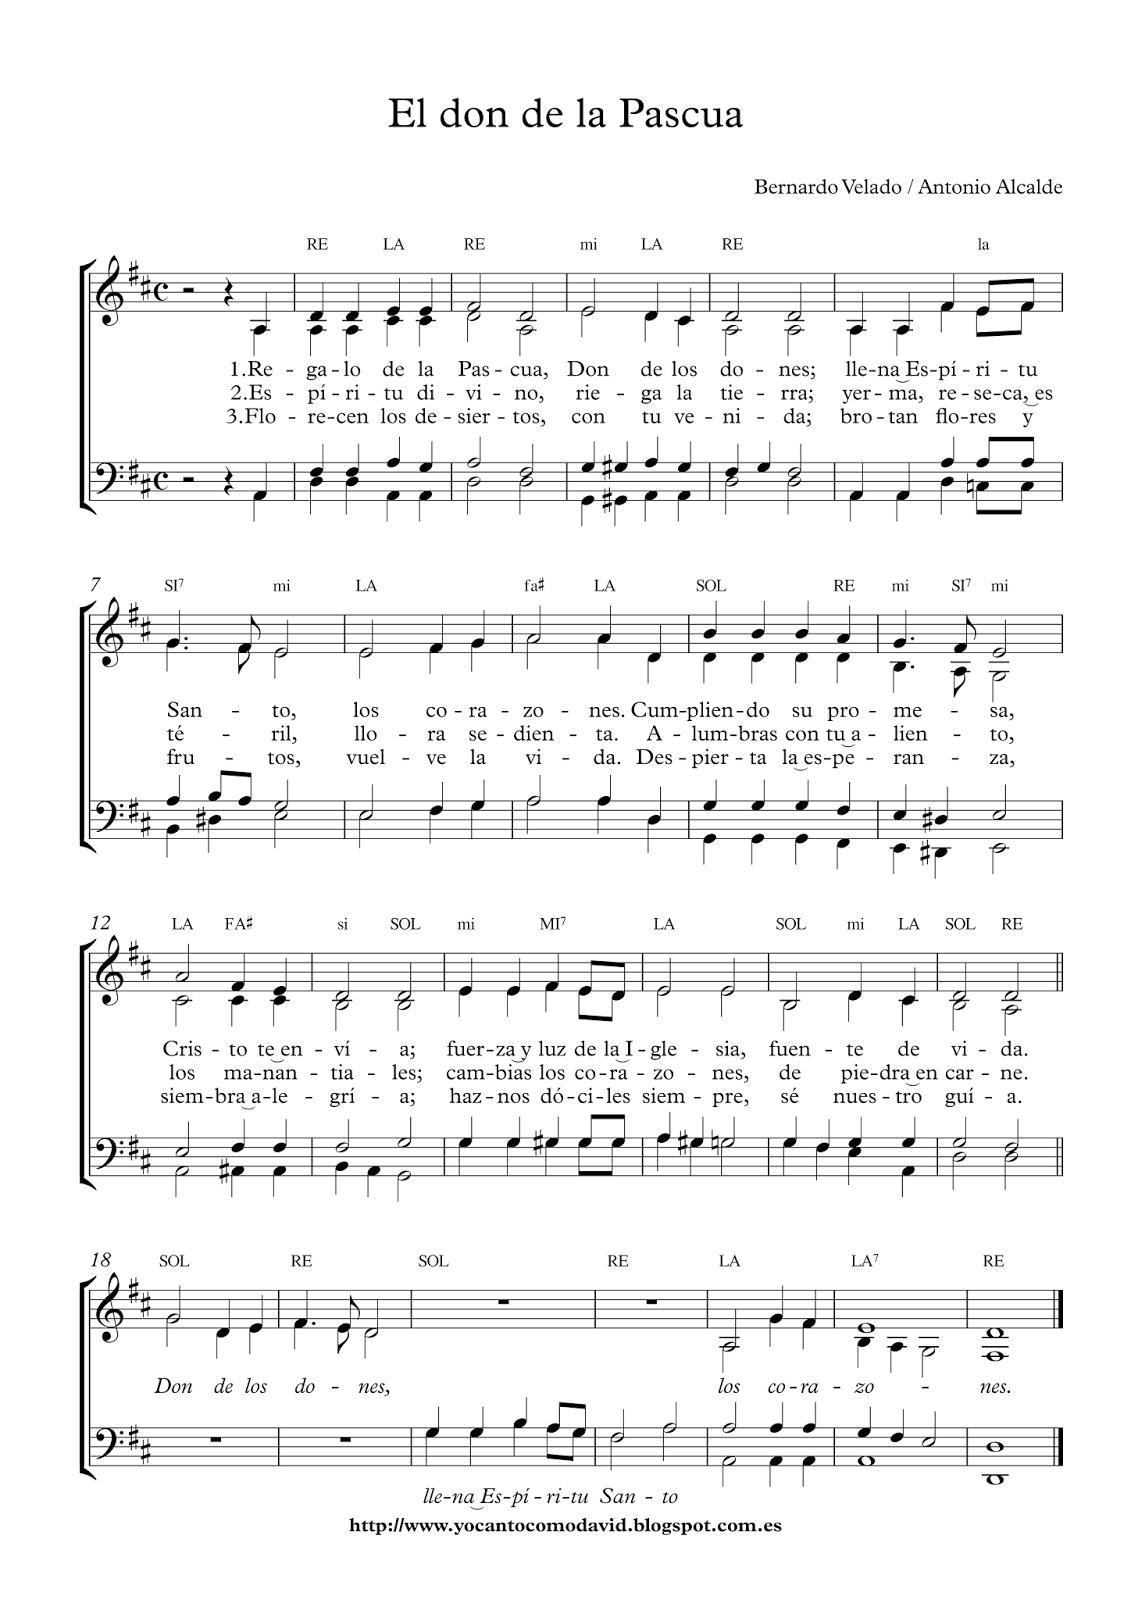 15 Minutos Con Jesus Sacramentado Juan Nolan Mp3 Descargar : minutos, jesus, sacramentado, nolan, descargar, Cancionero, Católico:, PASCUA., Letra:, Bernardo, Velado., Música:, Antonio, Alcalde